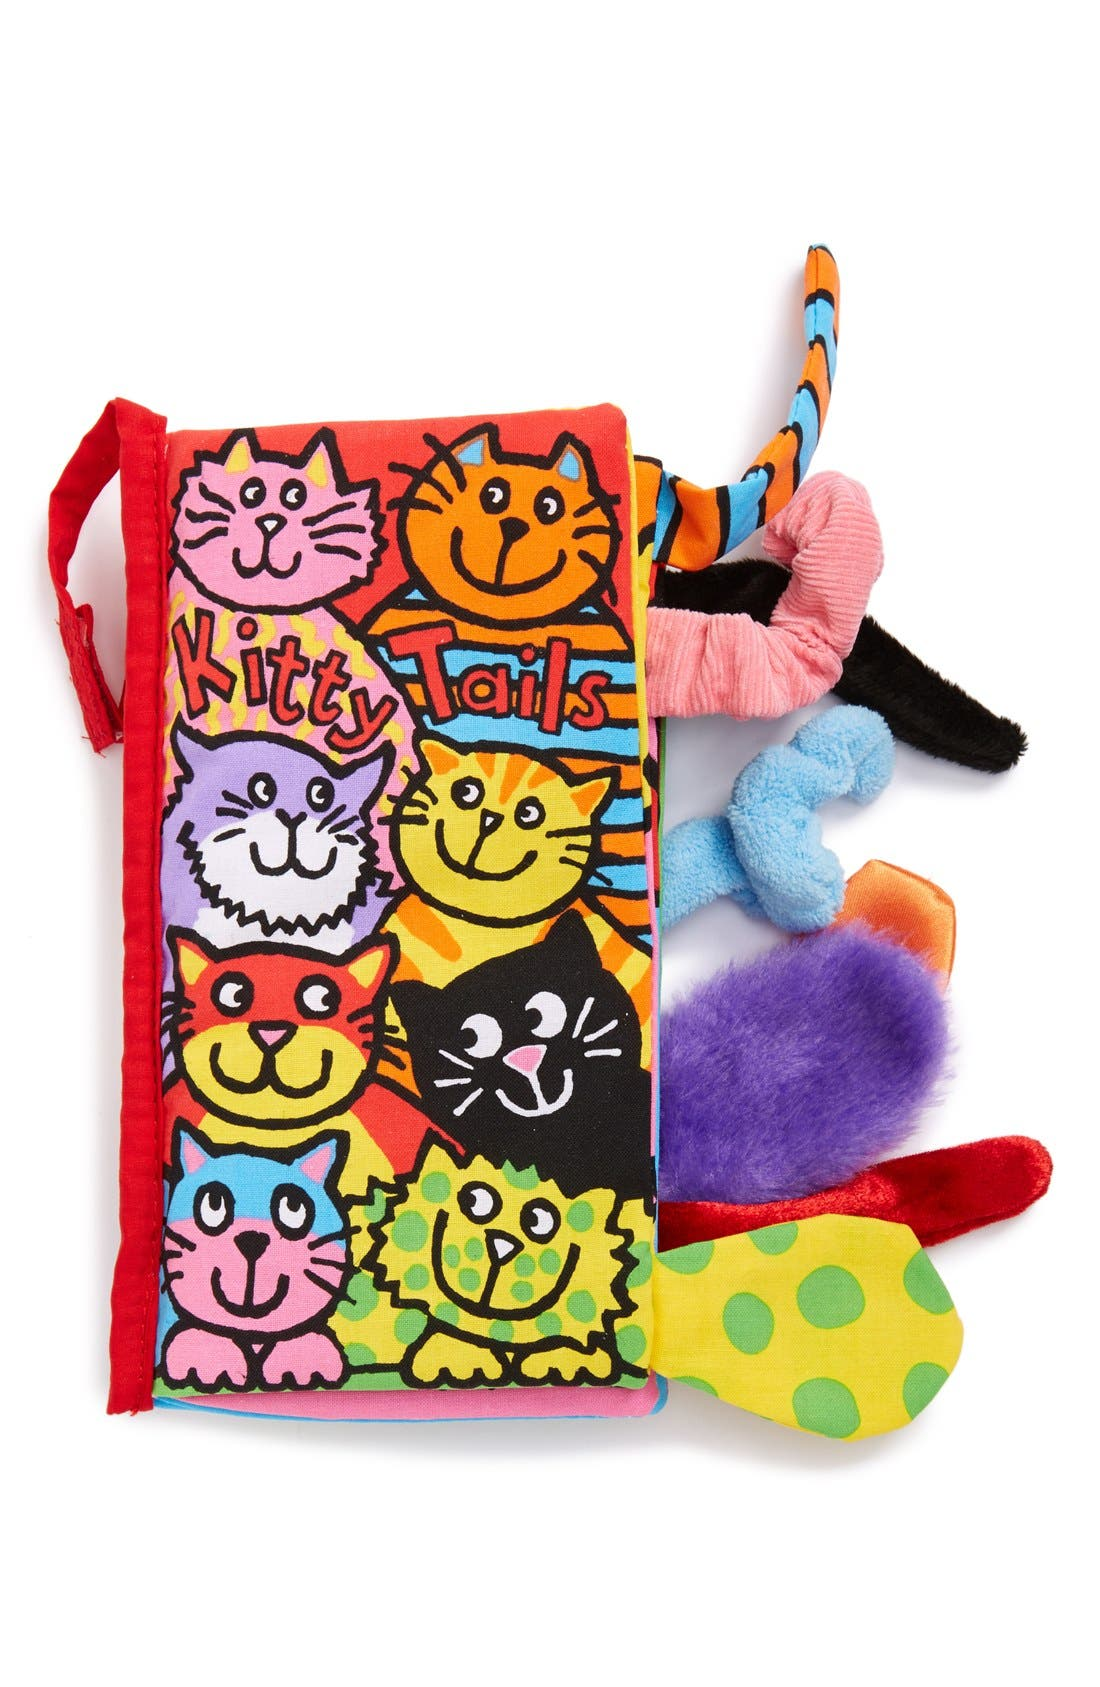 'Kitten Tails' Book